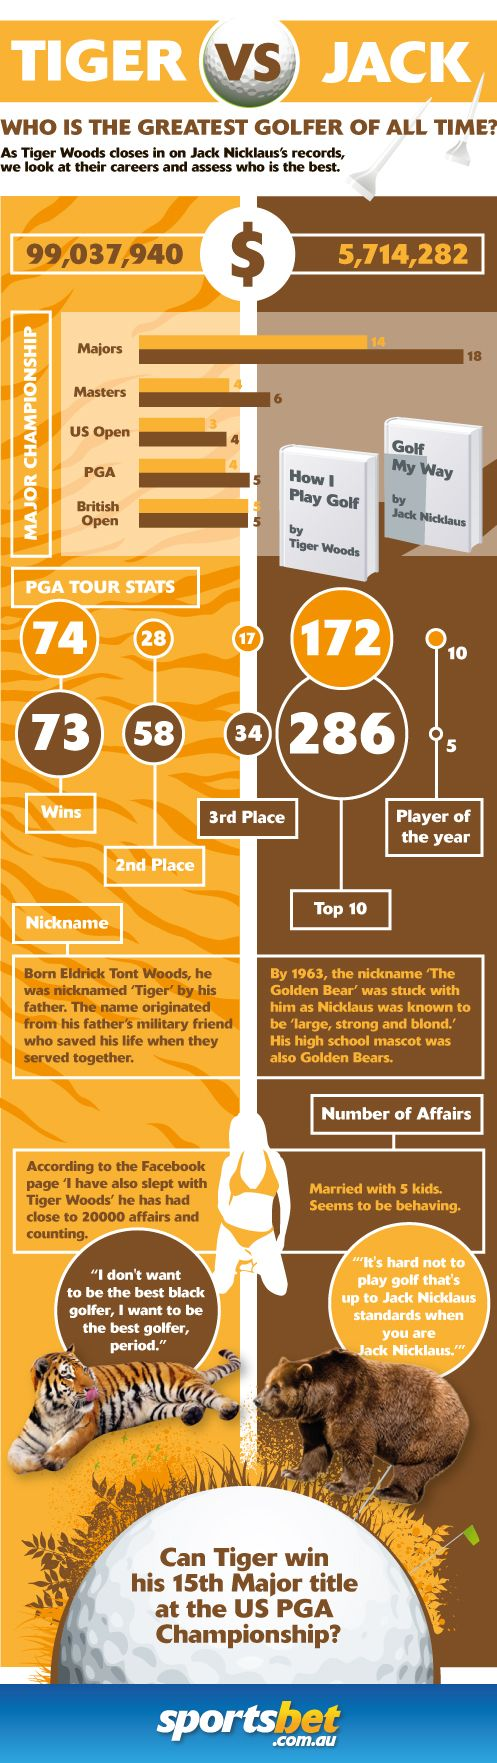 USPGA Championship - Infographic - Sportsbet.com.au